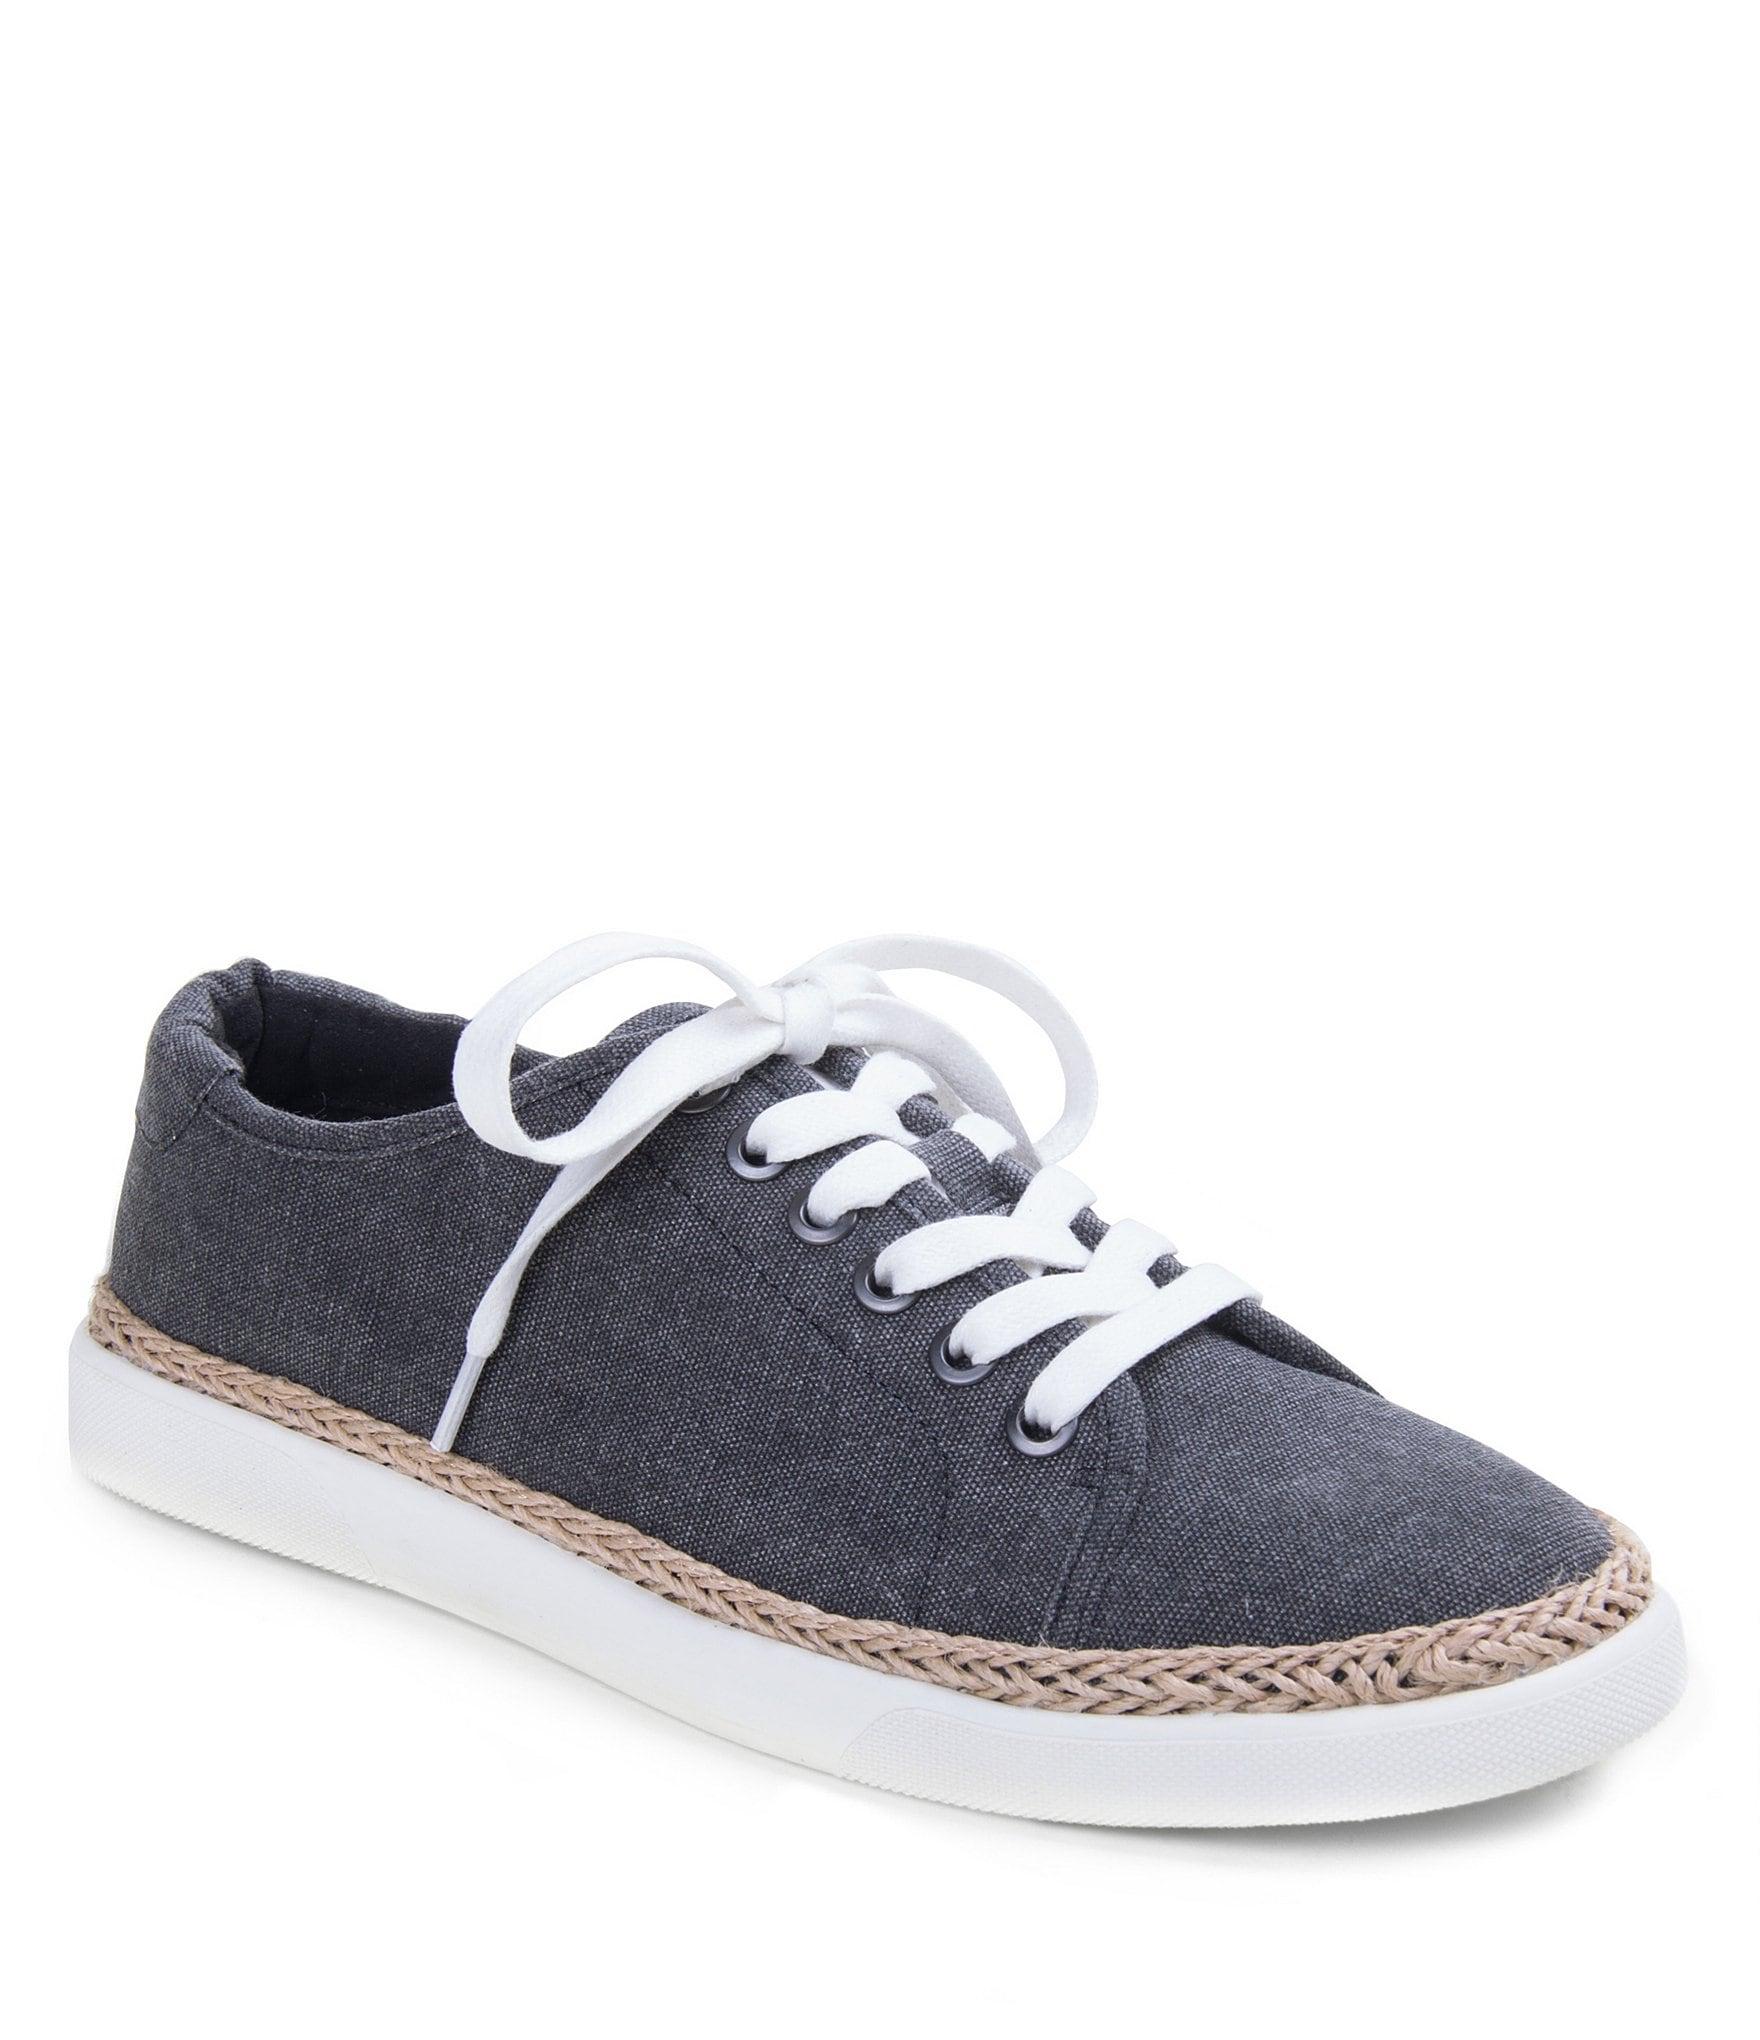 Faison Laceup Sneaker EdEXU